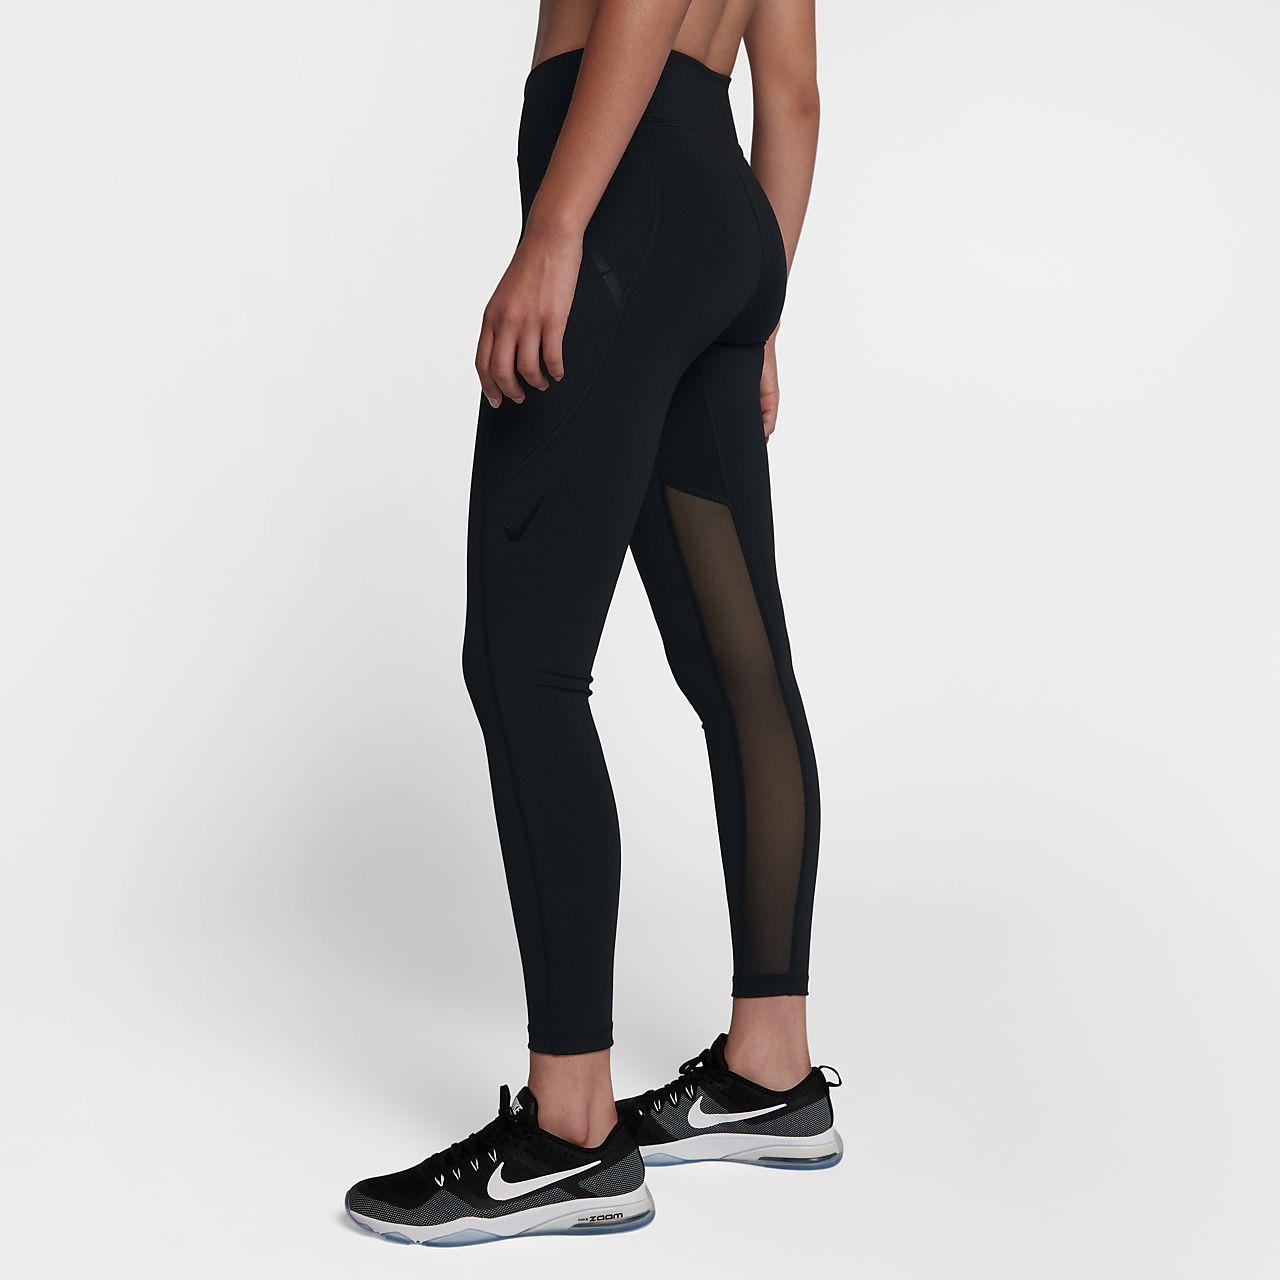 e5a6003598 Nike Power Pocket Lux magas derekú, testhezálló női edzőnadrág. Nike ...